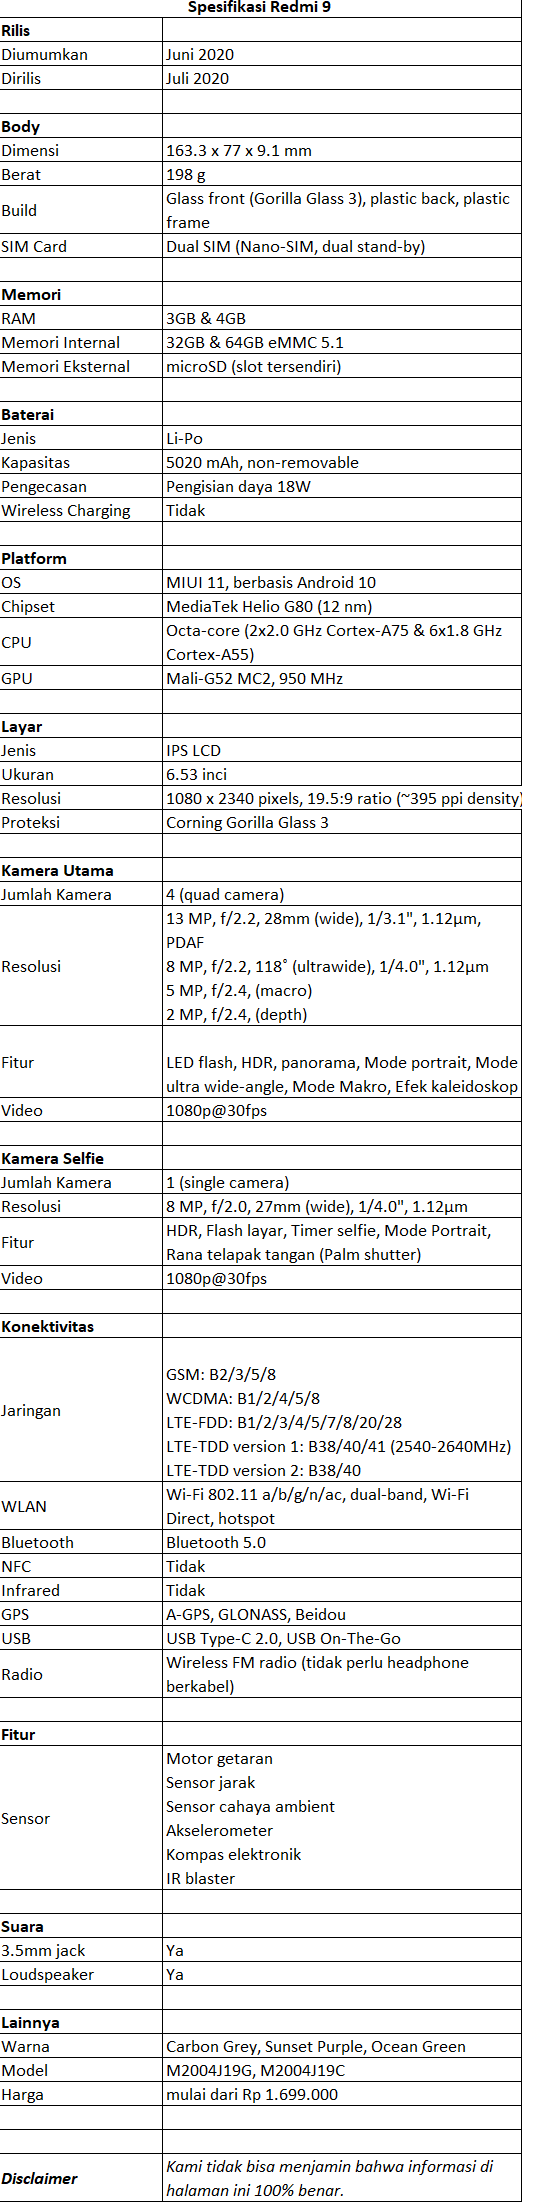 spesifikasi redmi 9